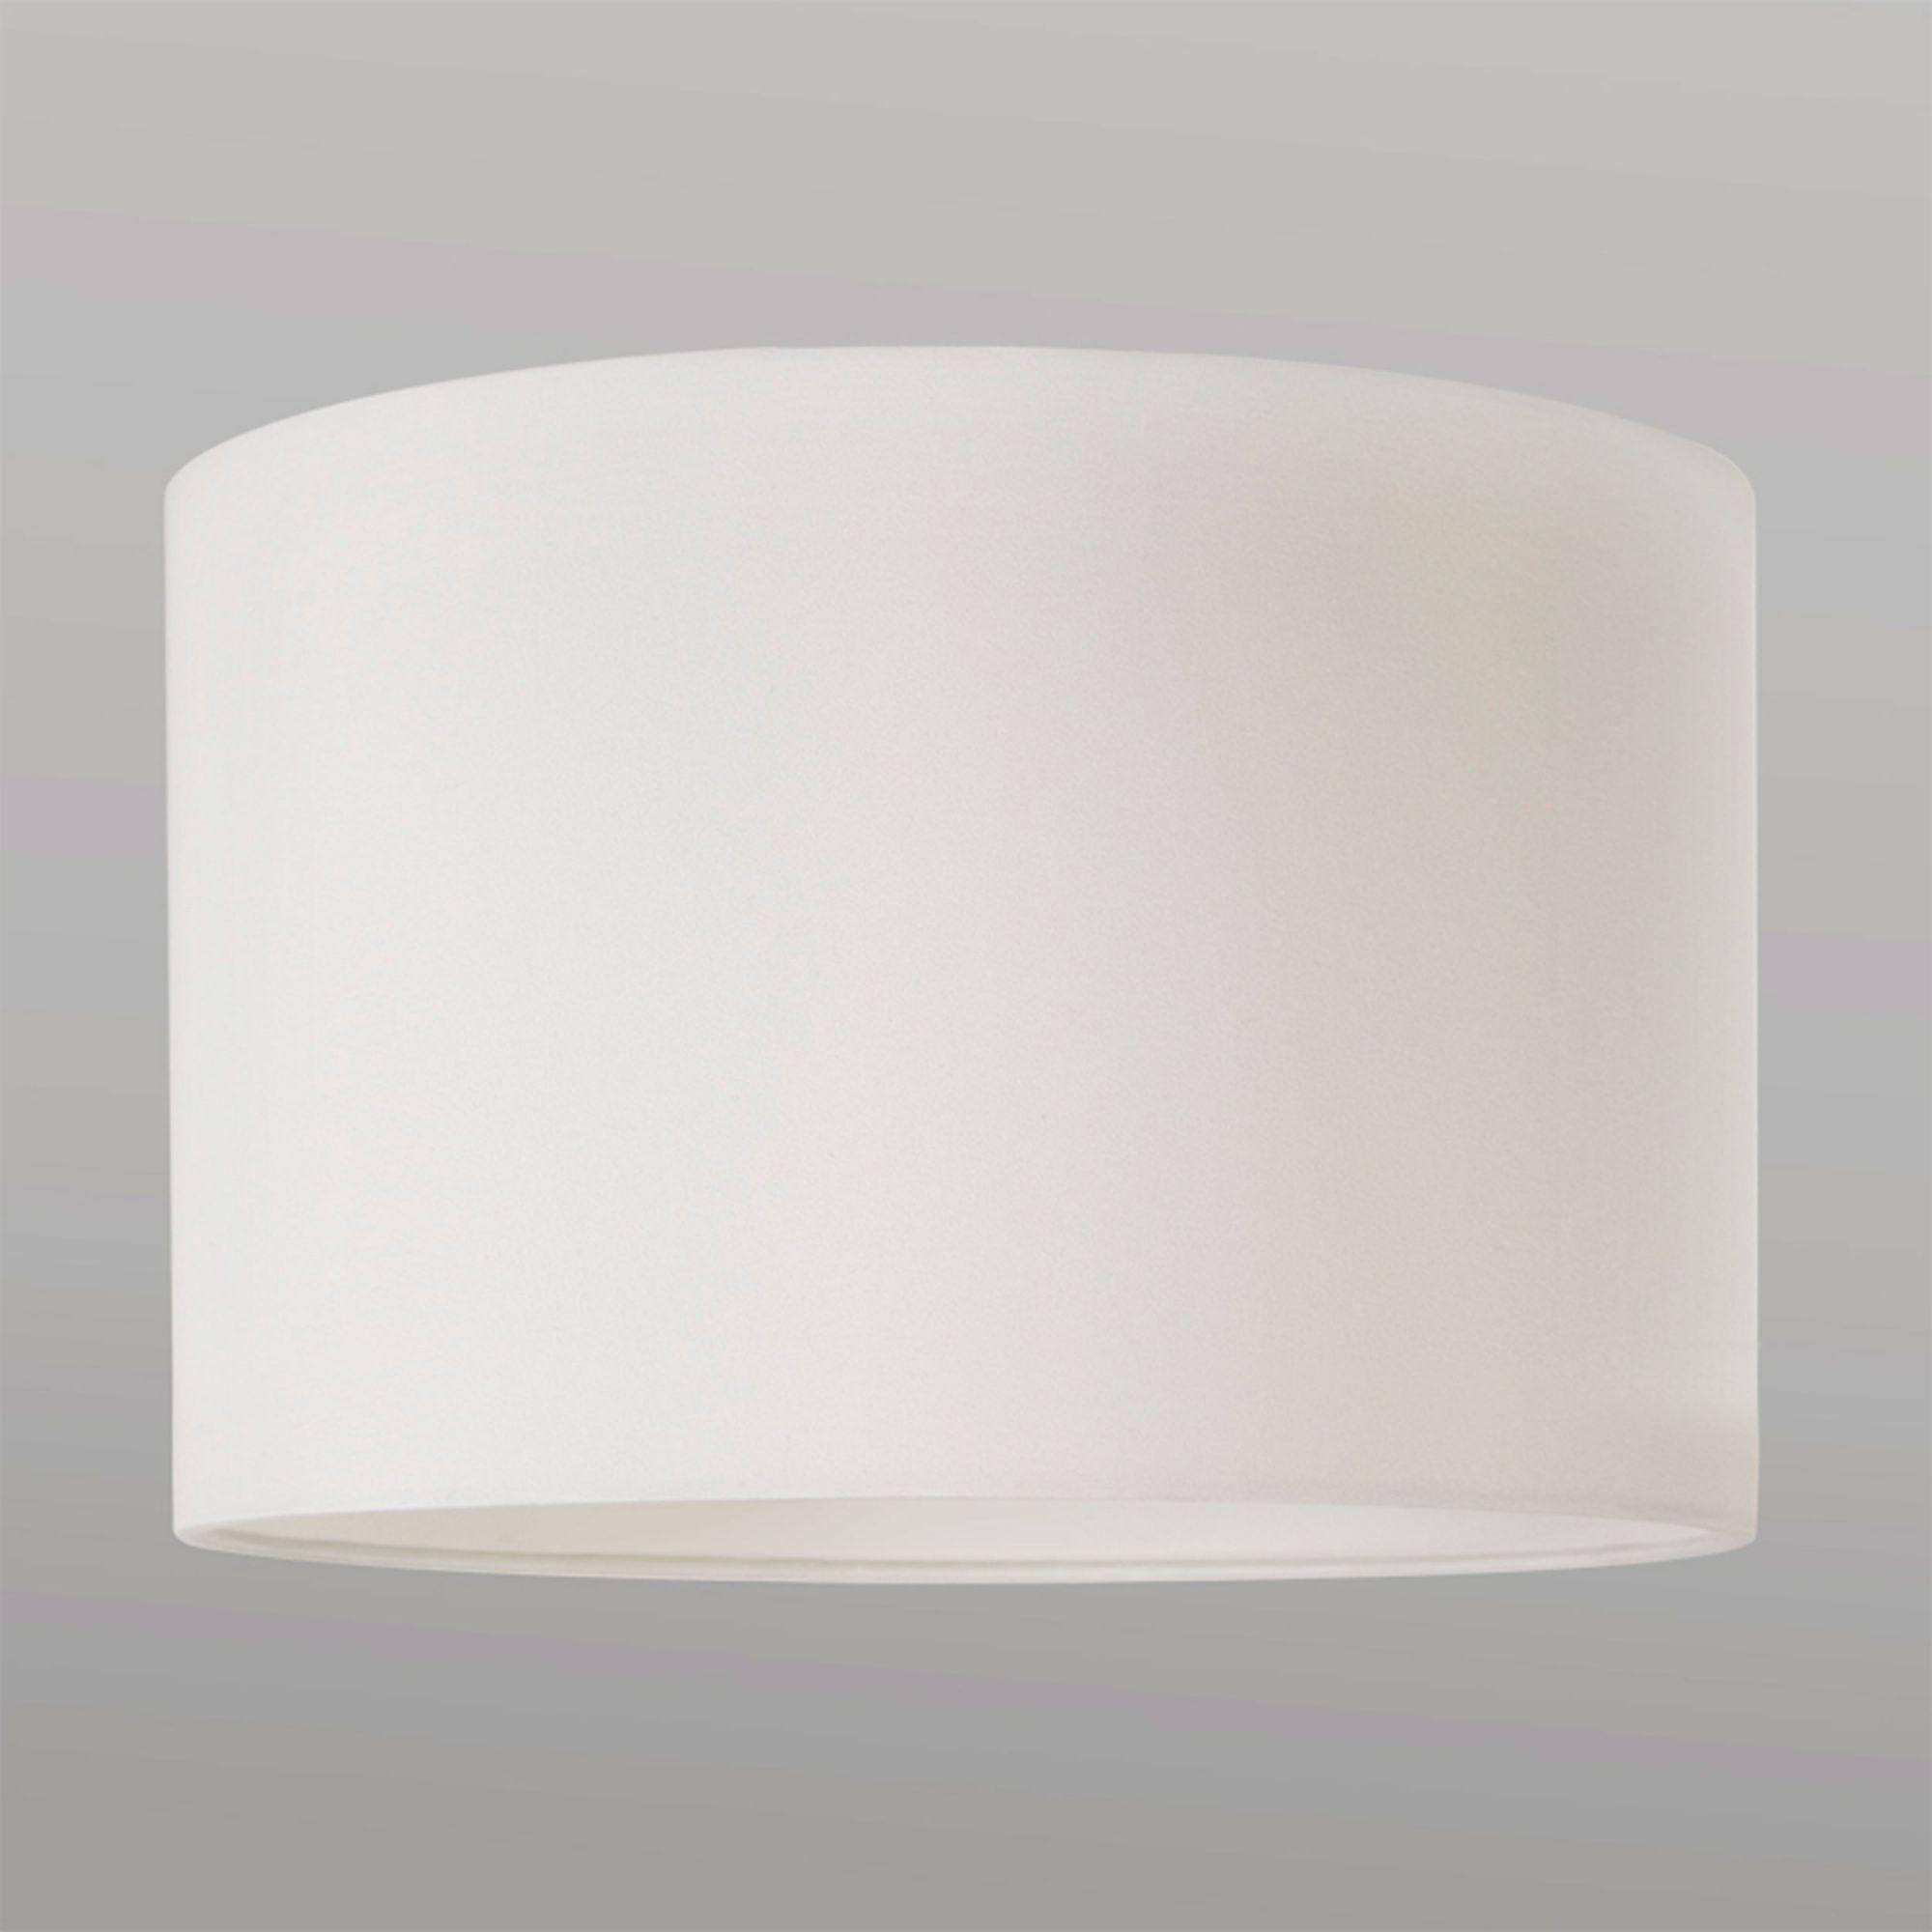 Abażur Drum 250 4093 Biały Astro Lighting